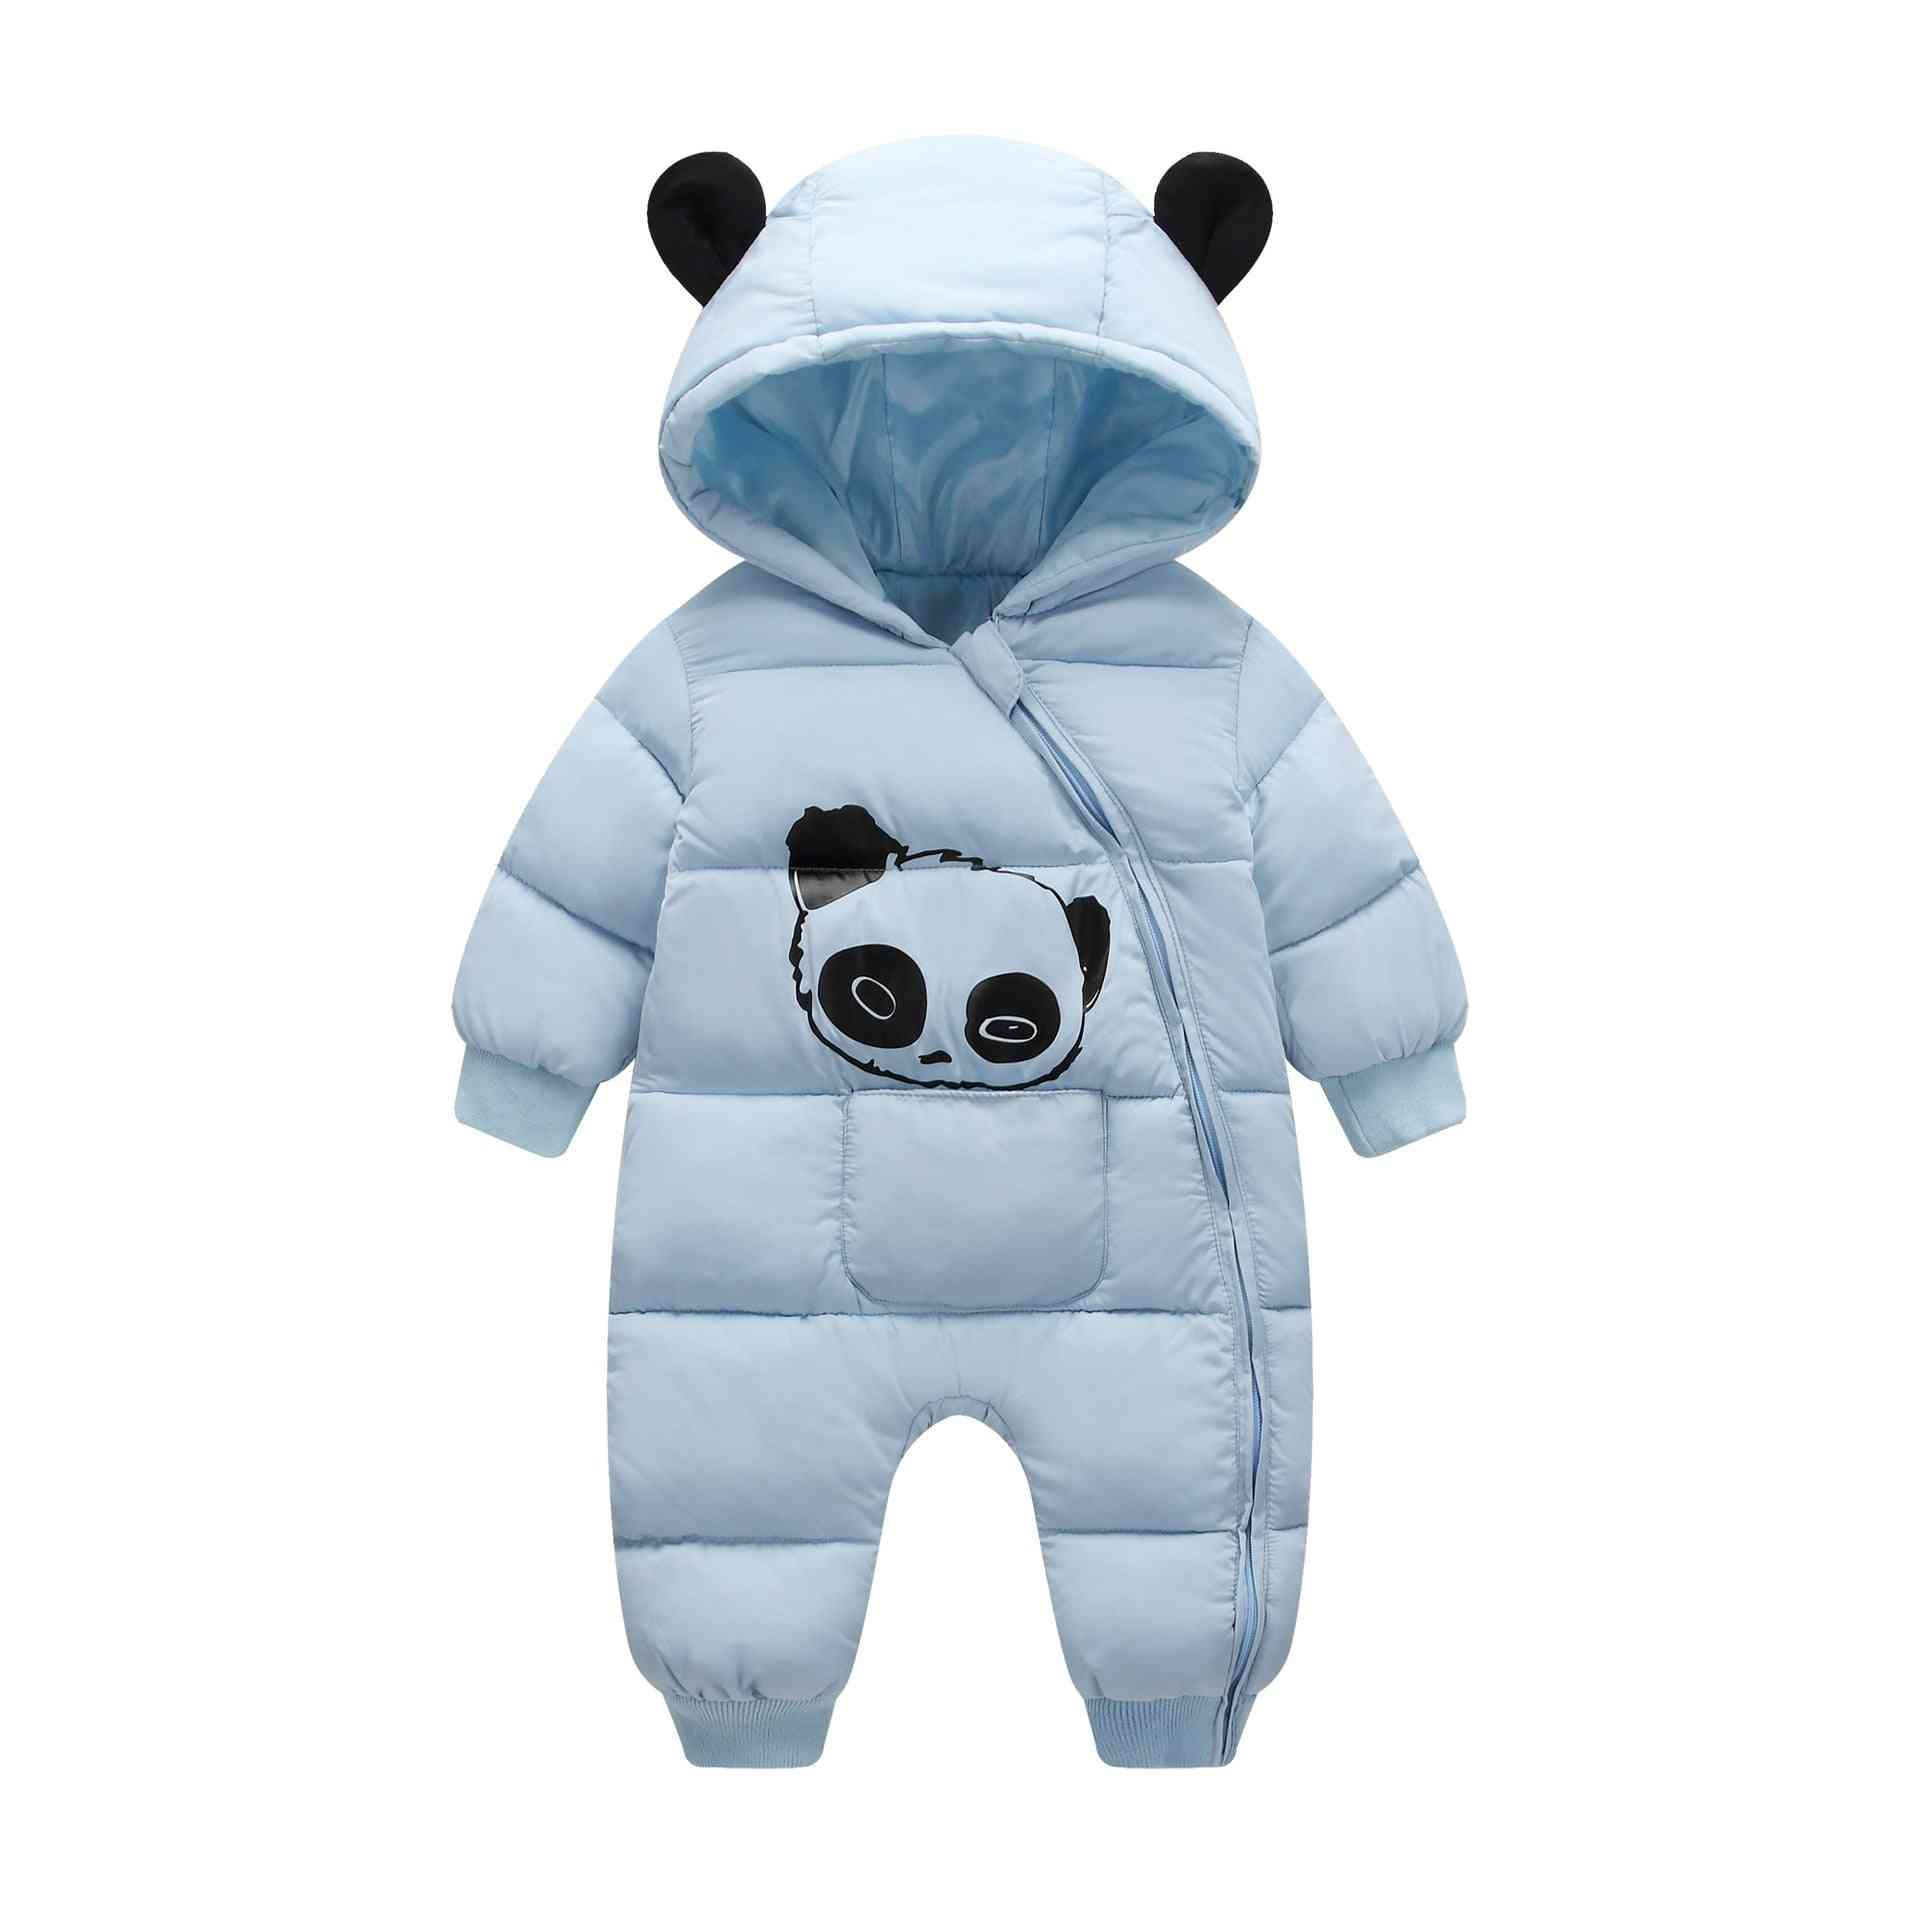 Cartoon Panda Thick Warm Newborn Baby Girl Jumpsuit / Snowsuit Boy Rompers Overalls